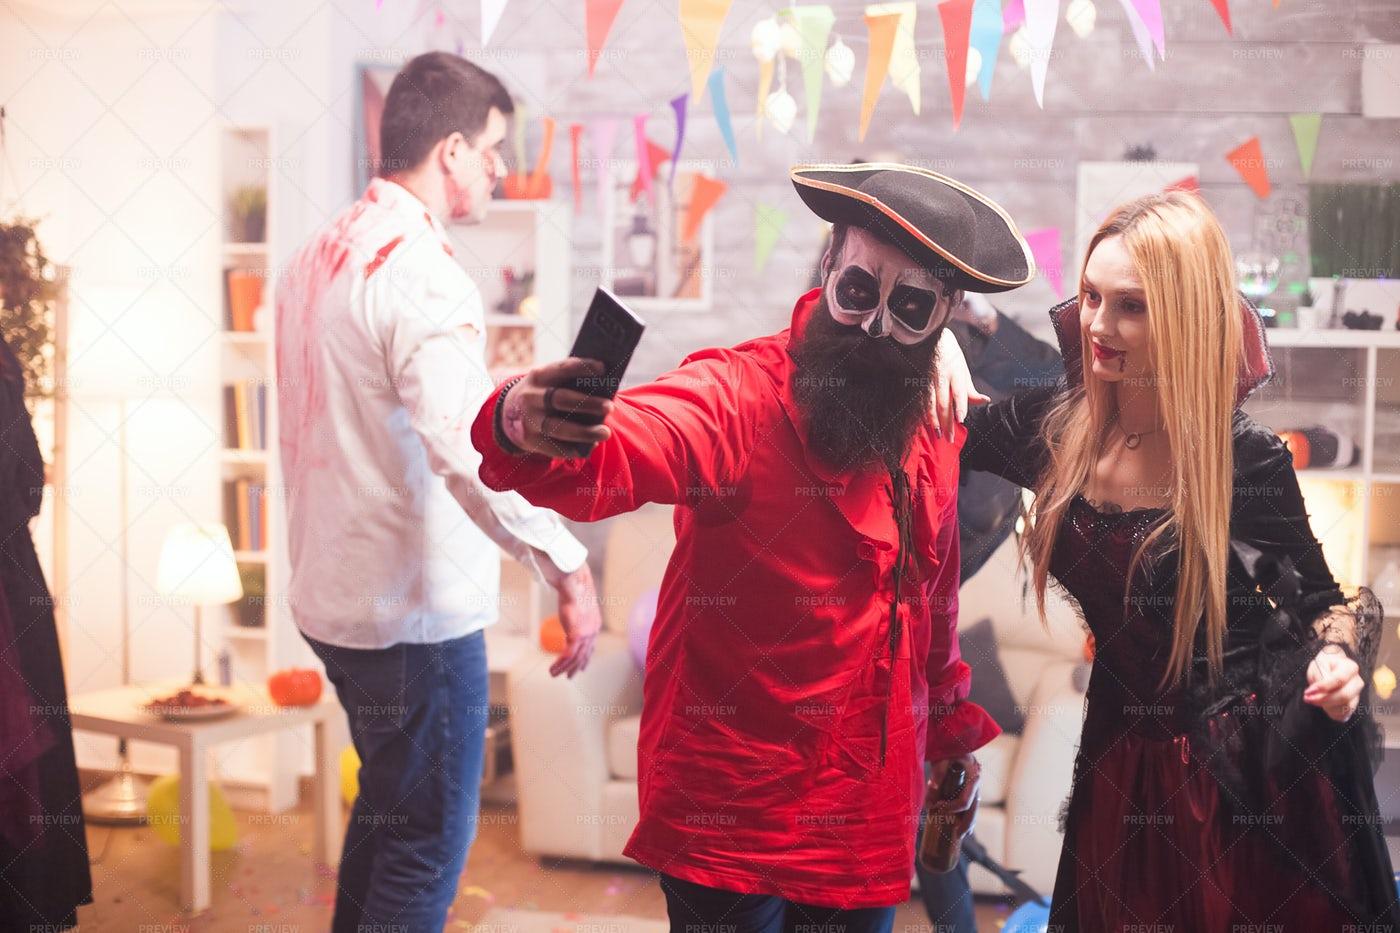 Selfie At Halloween Party: Stock Photos